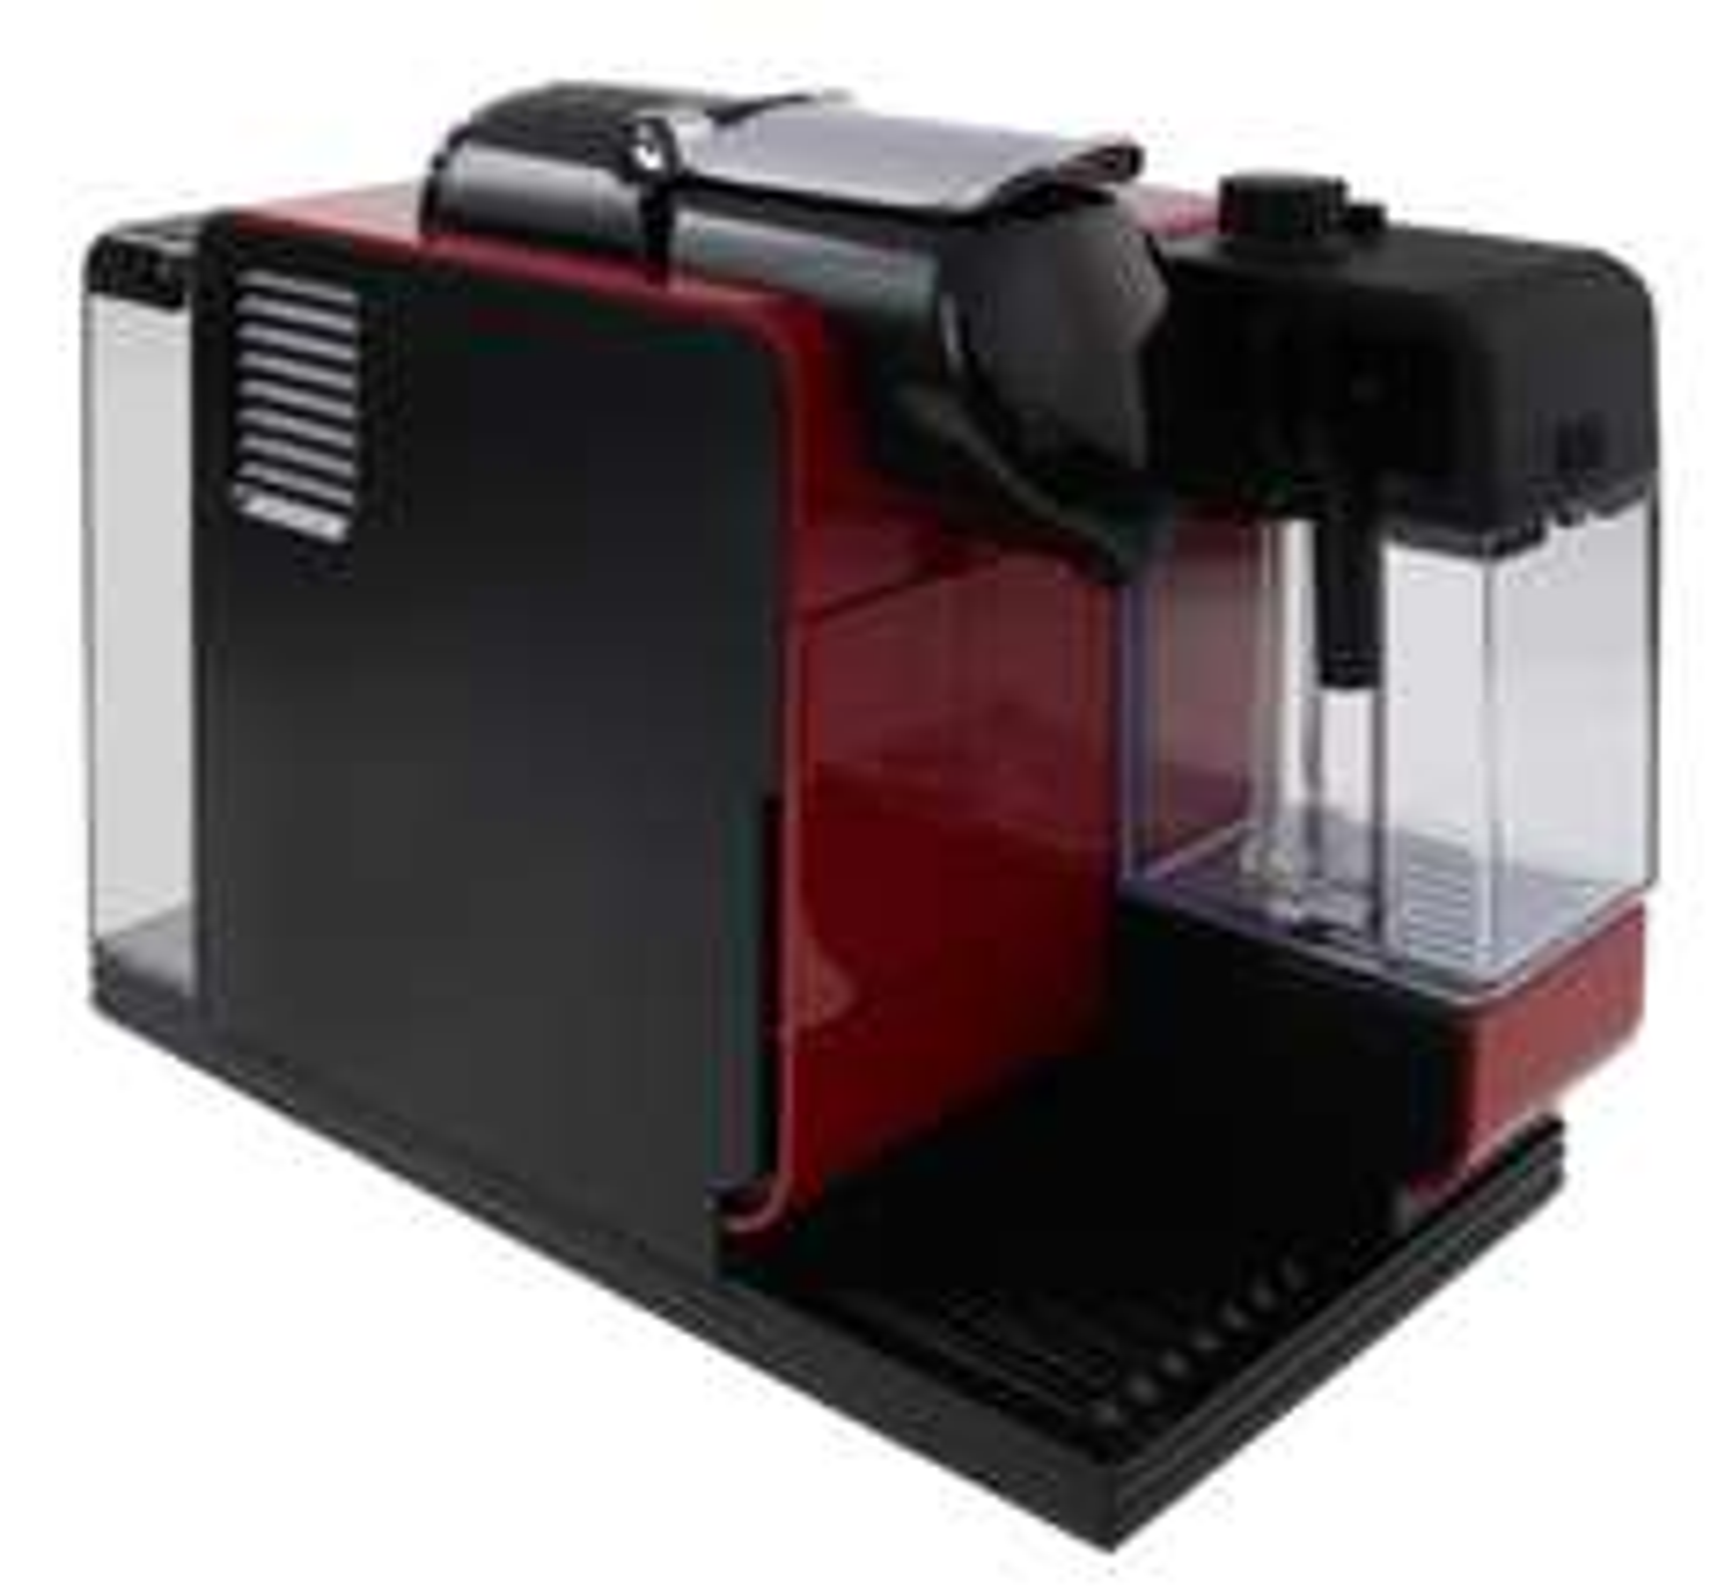 DeLonghi EN 521.R Lattissima+ Nespresso Kapselmaschine + 70€ Kapselguthaben bei Nespresso